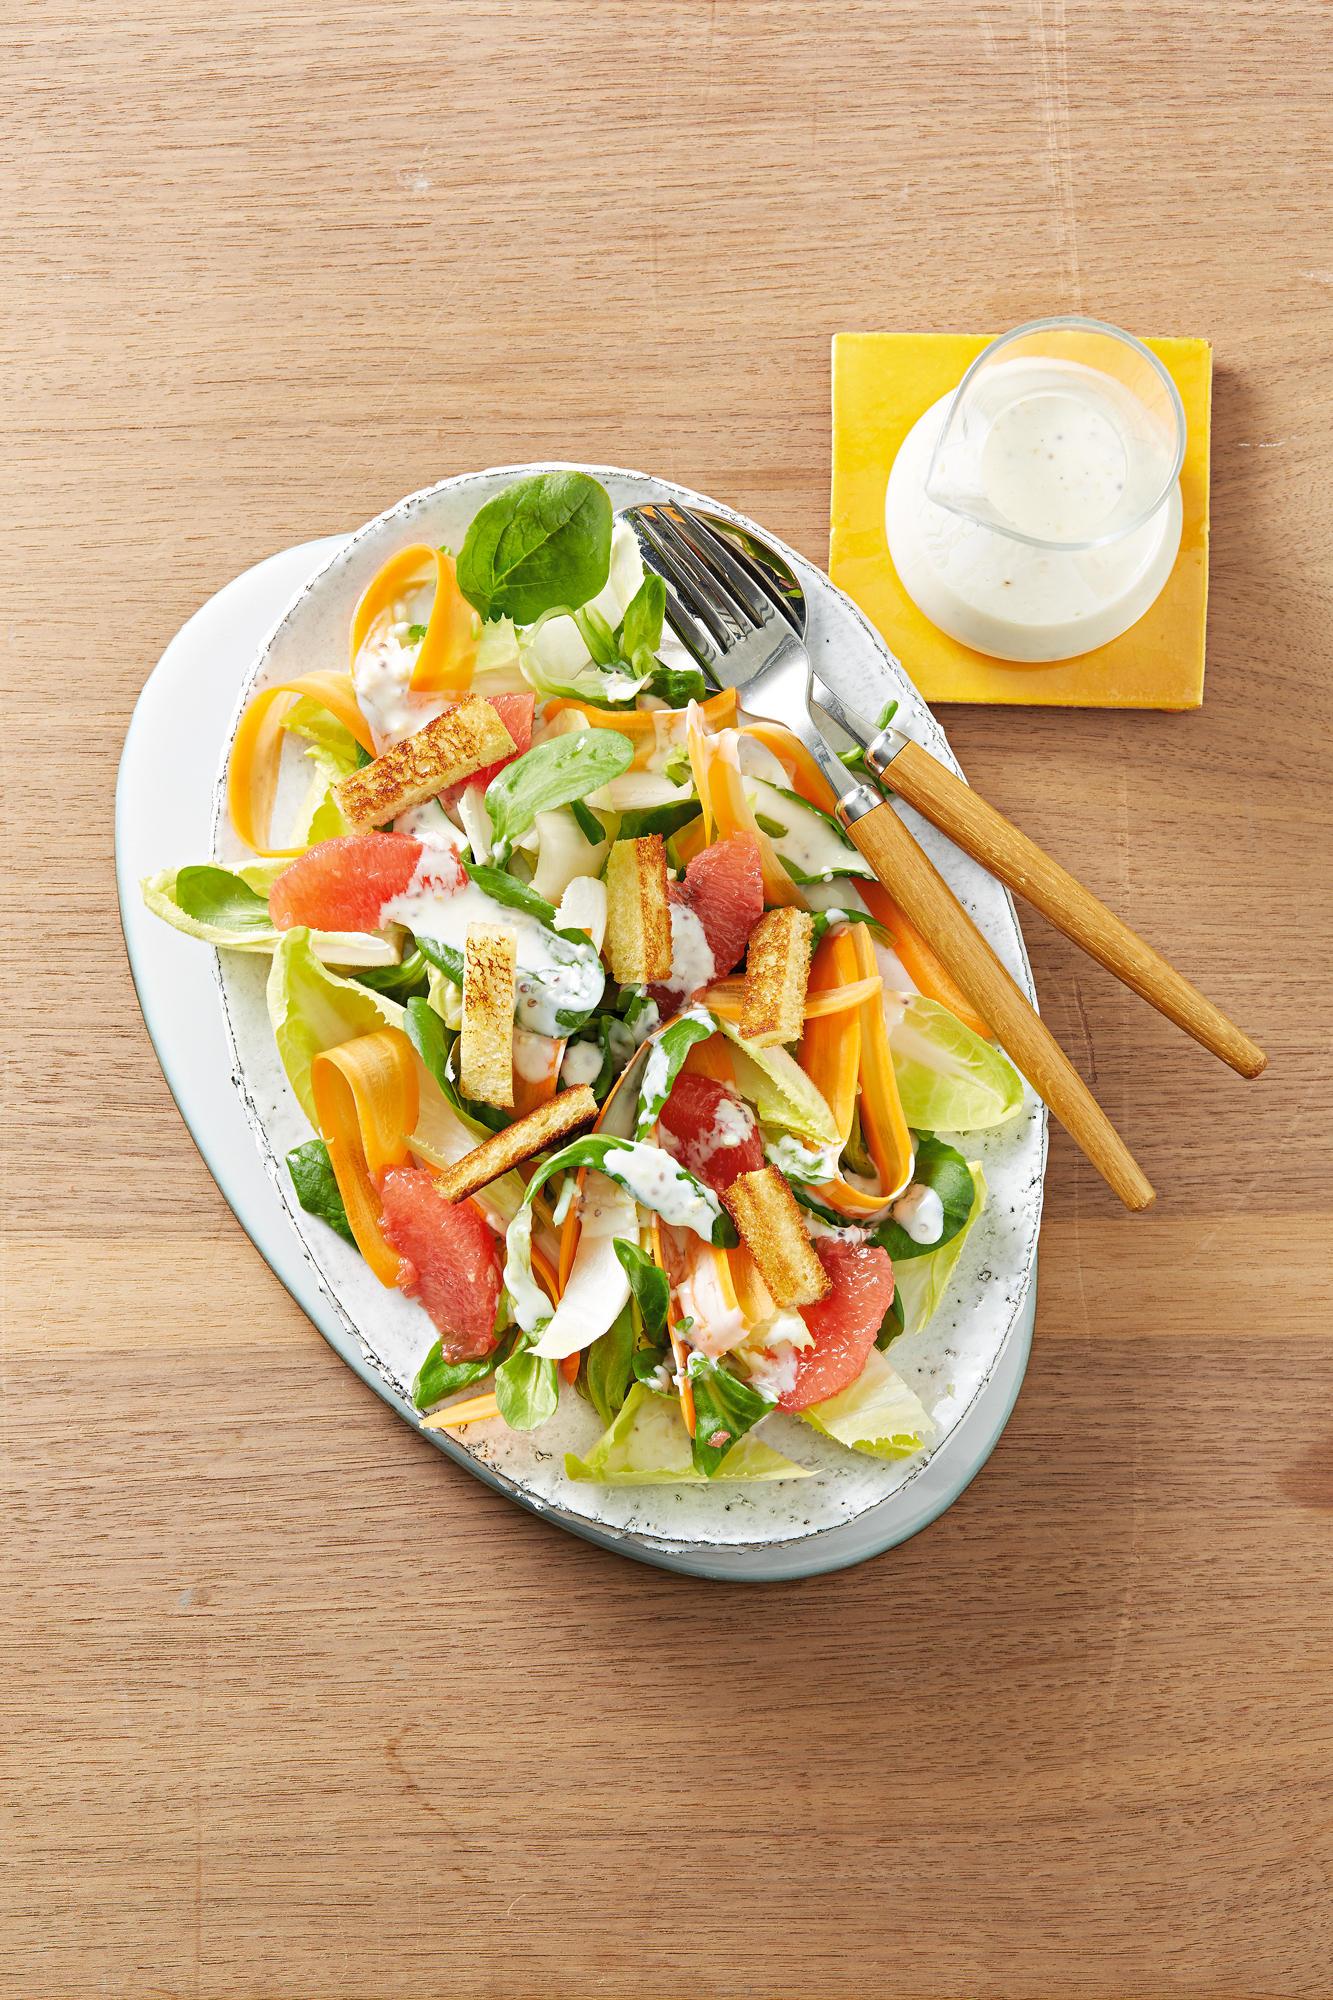 hilft salat beim abnehmen